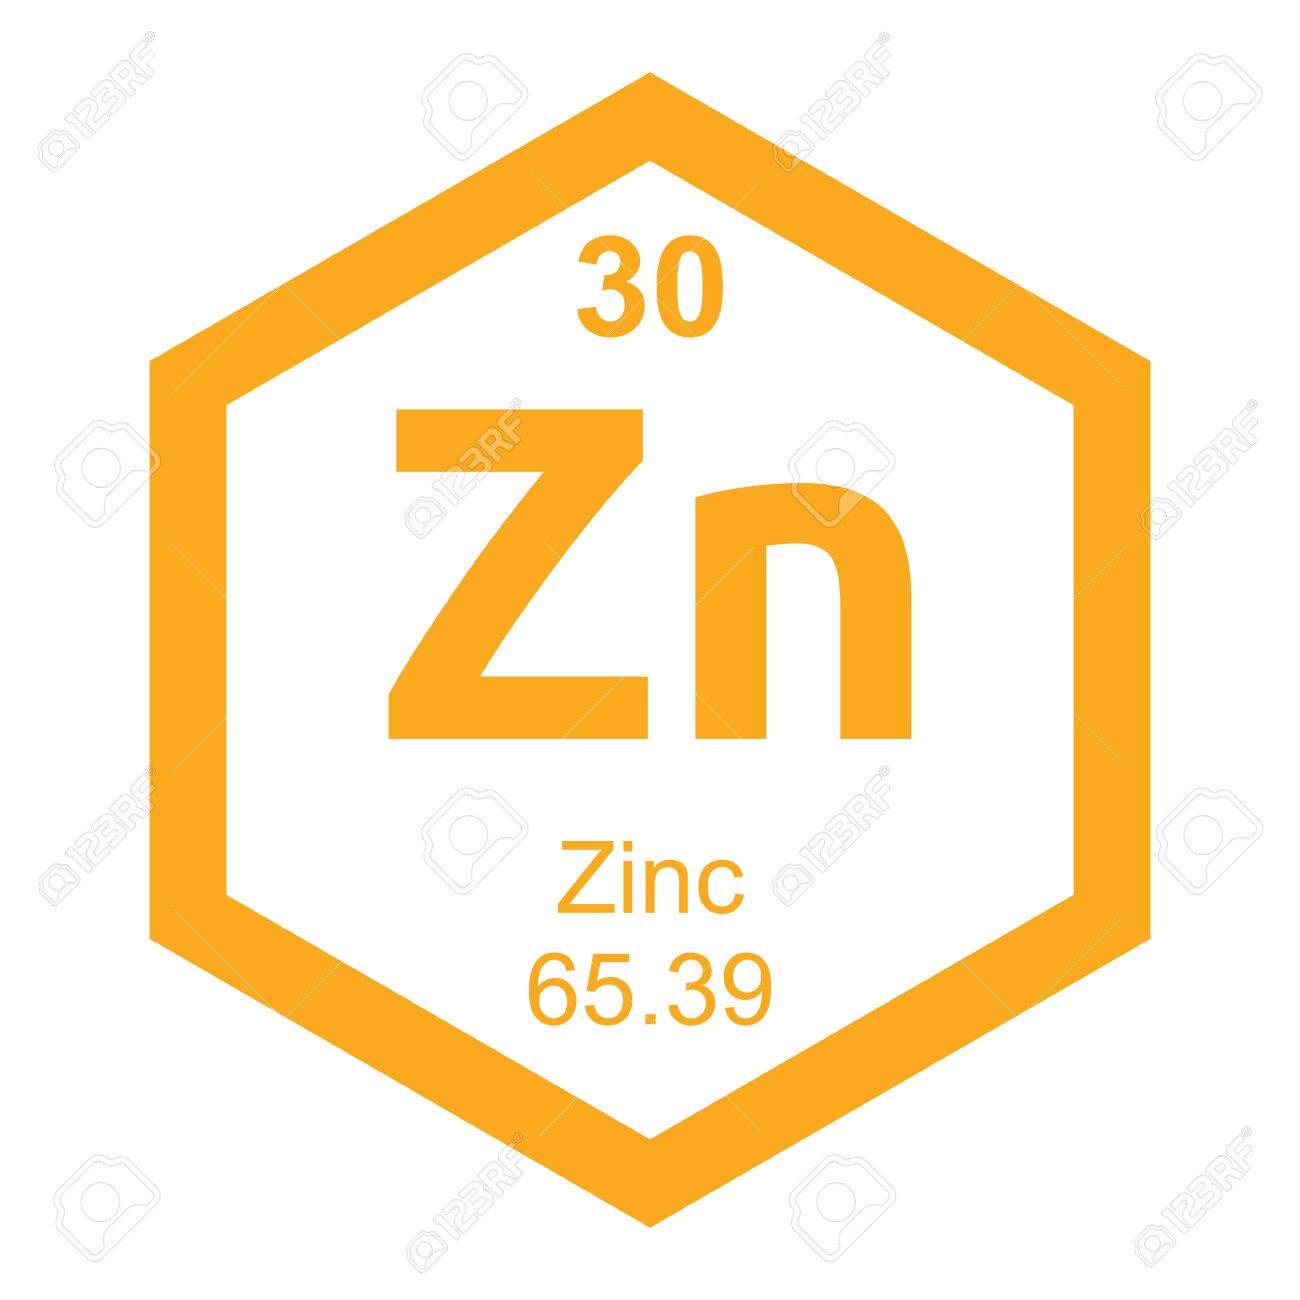 Periodic table Zinc - 41503343